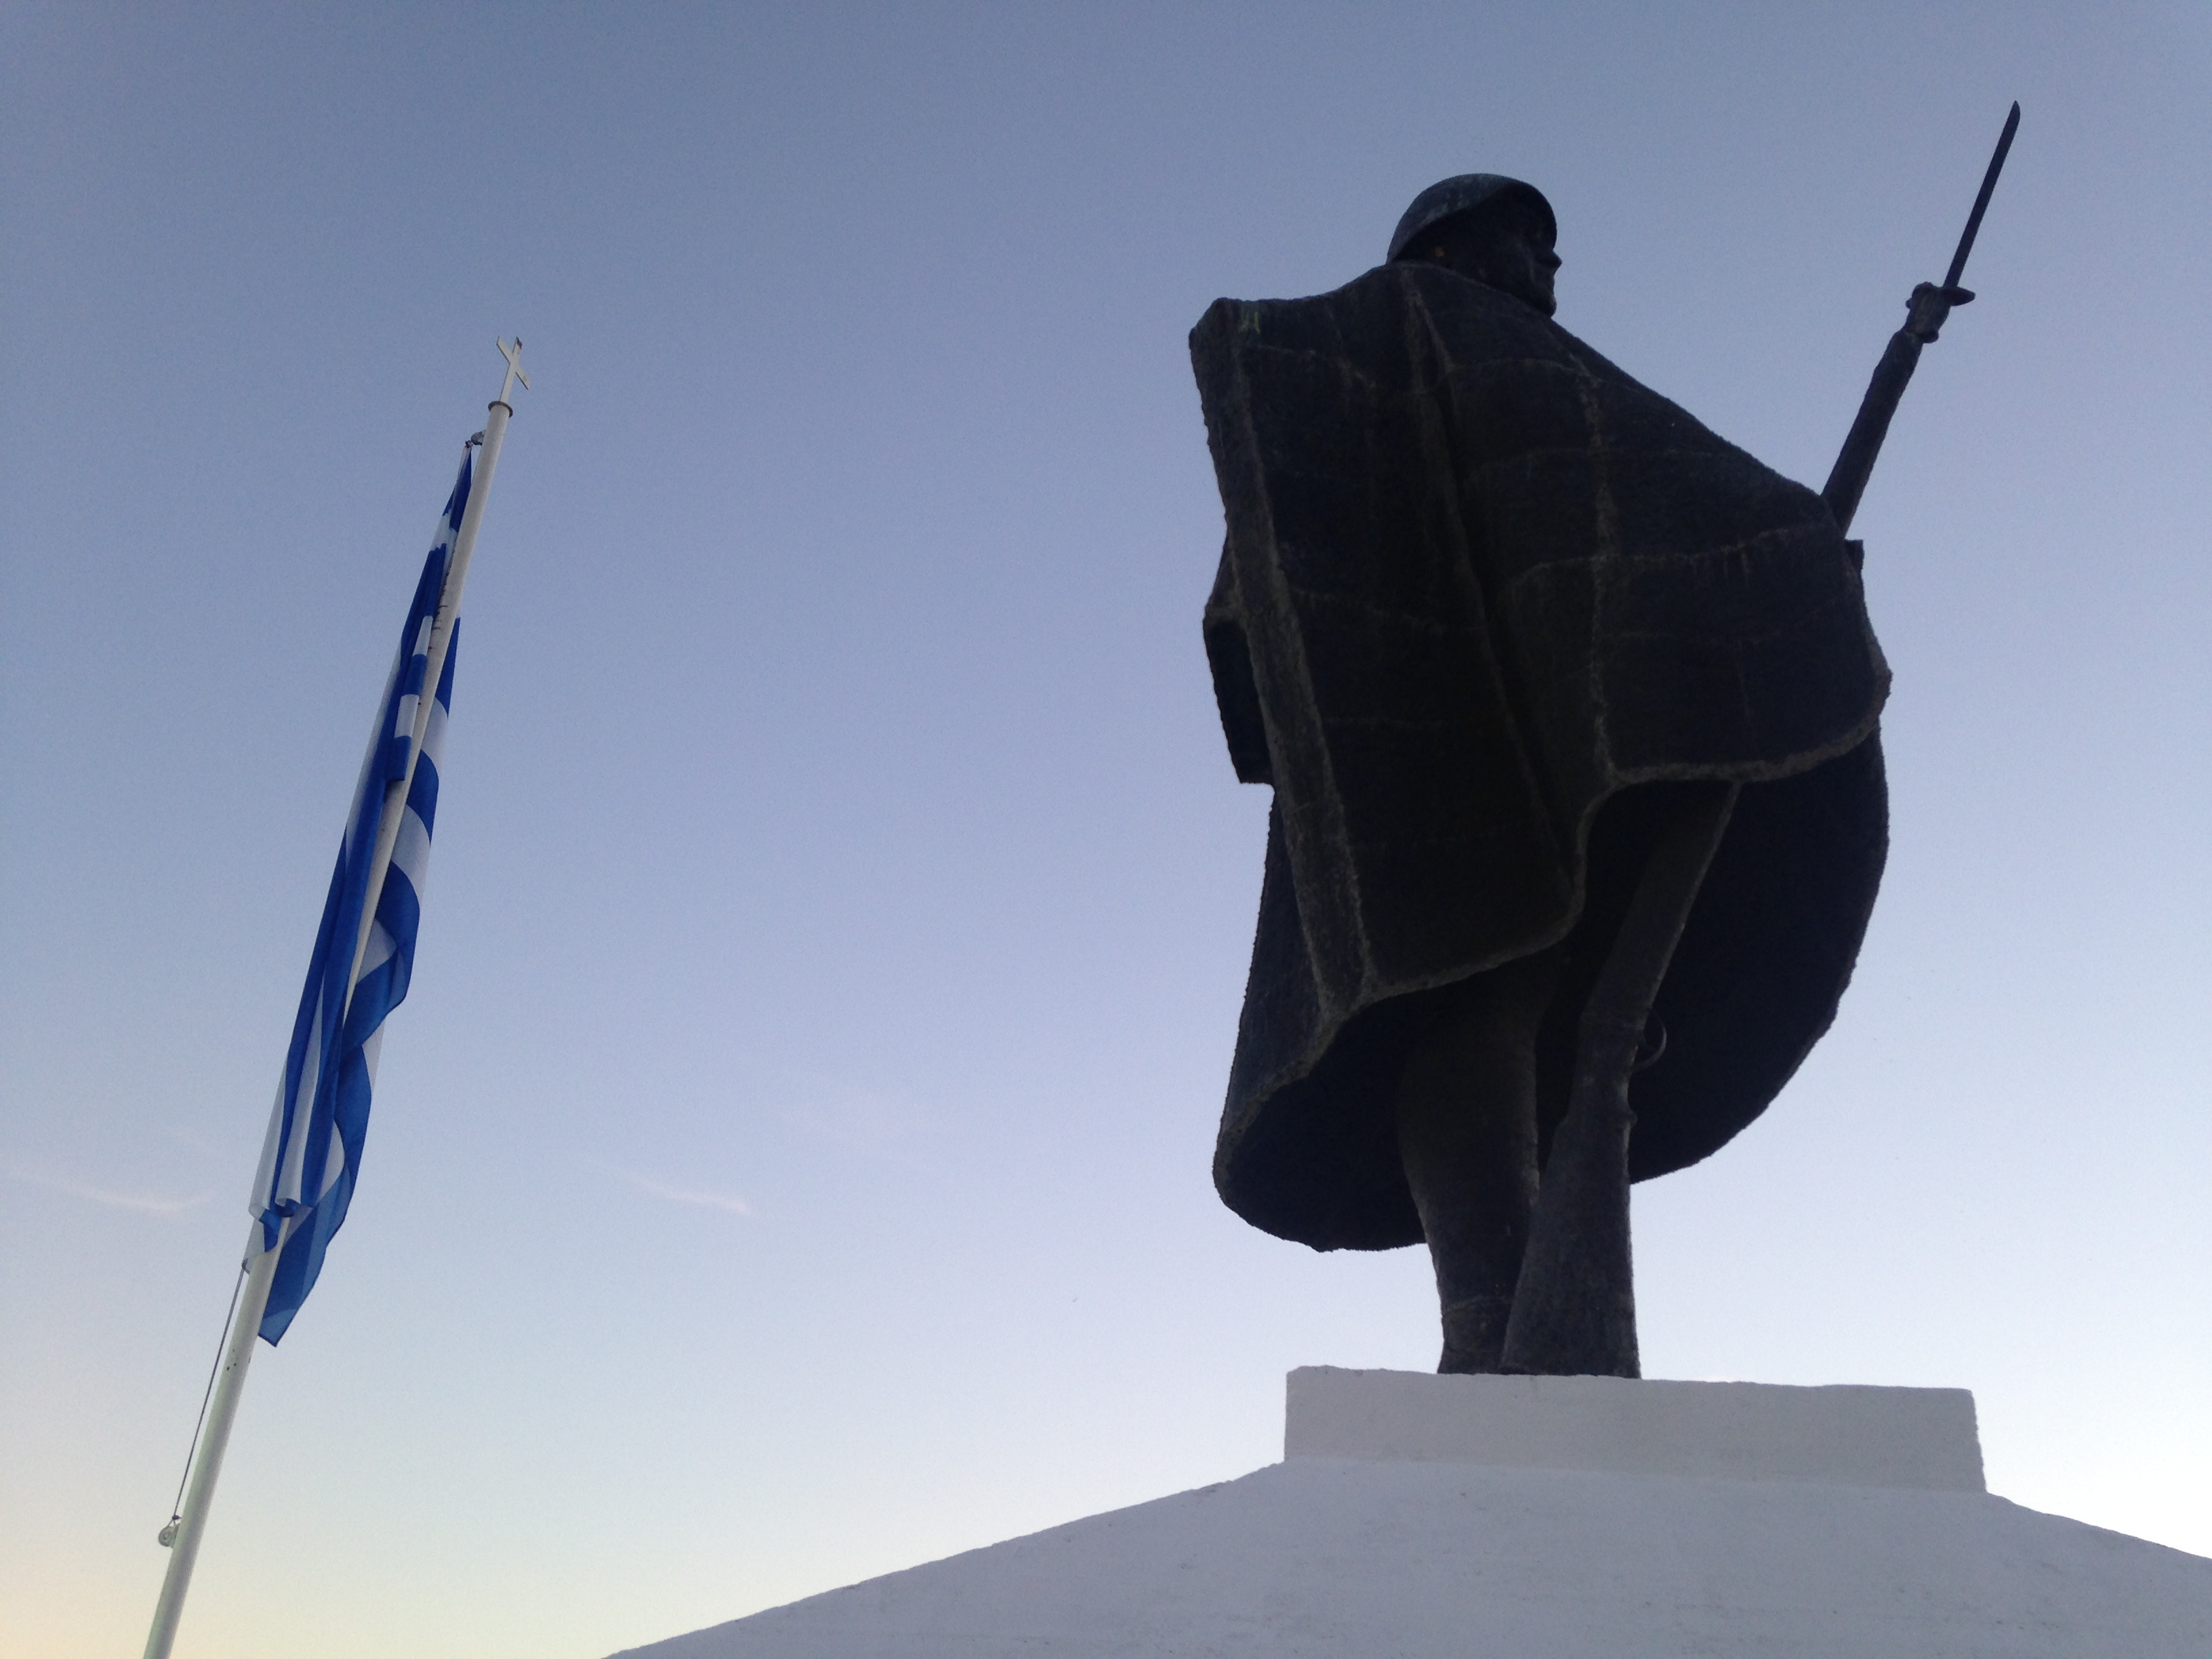 H Energean Oil & Gas τιμά τους ήρωες της Μάχης στο Καλπάκι